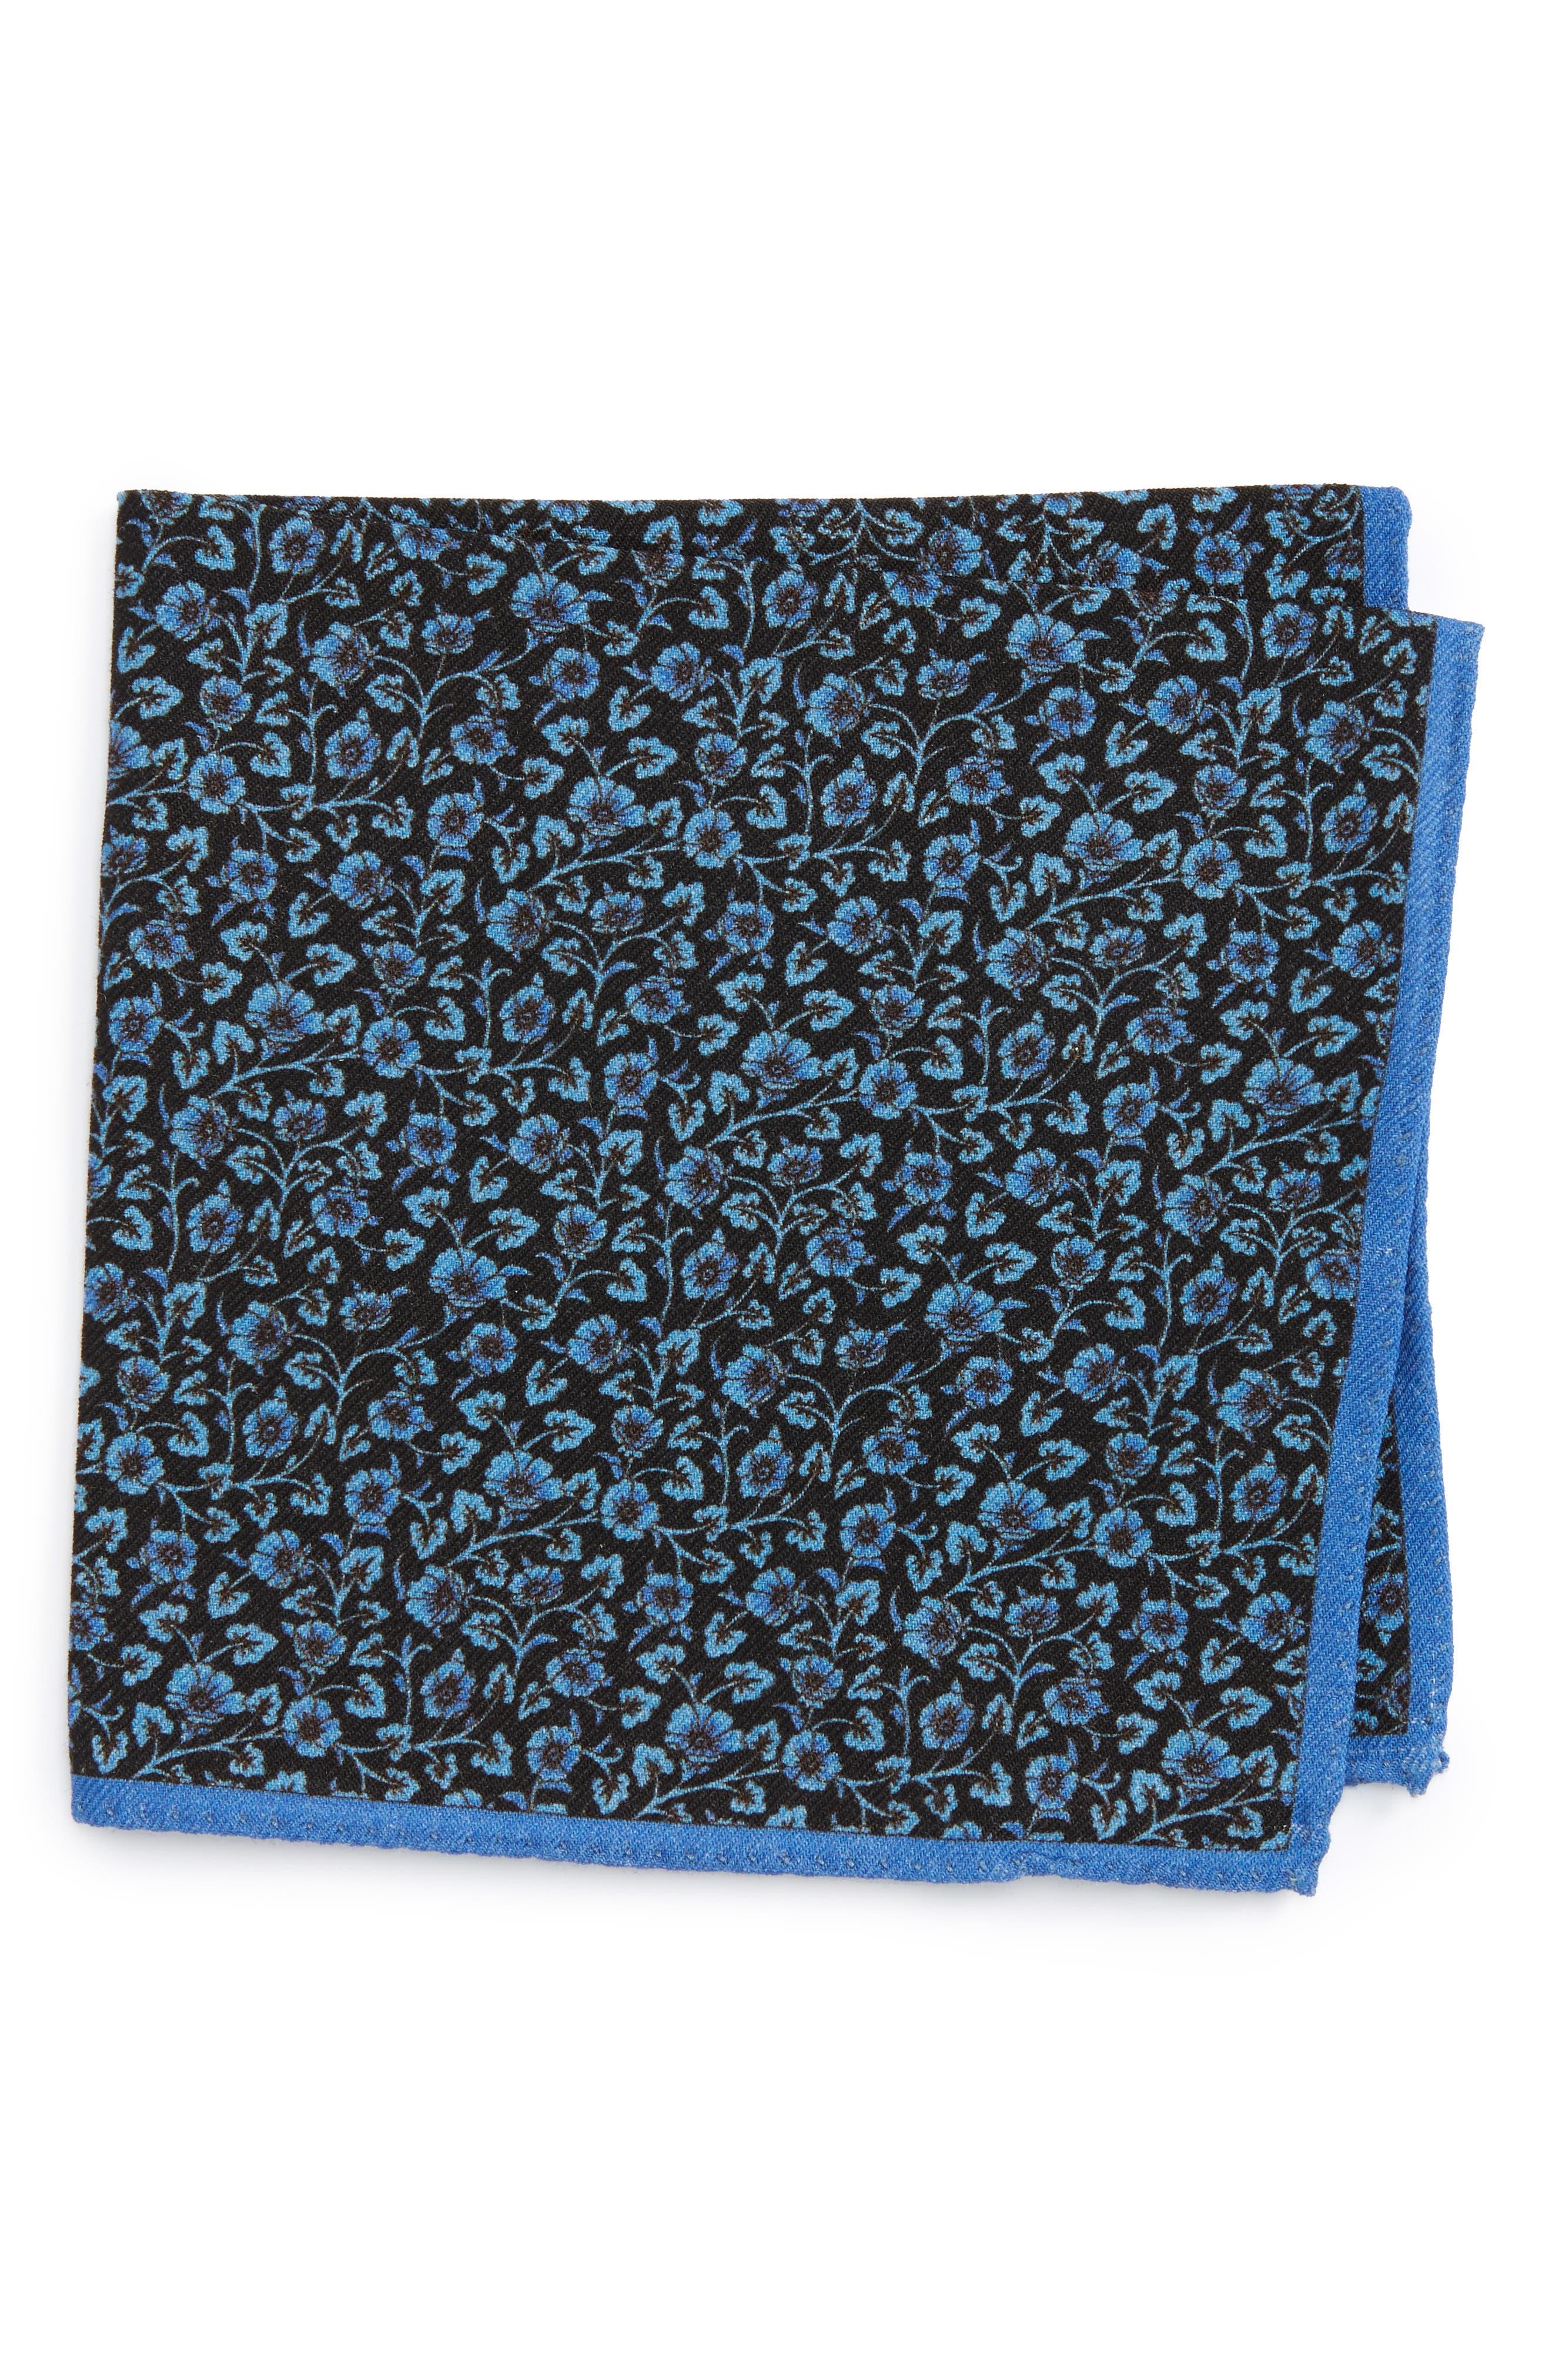 Main Image - Ted Baker London Clover Print Wool Pocket Square